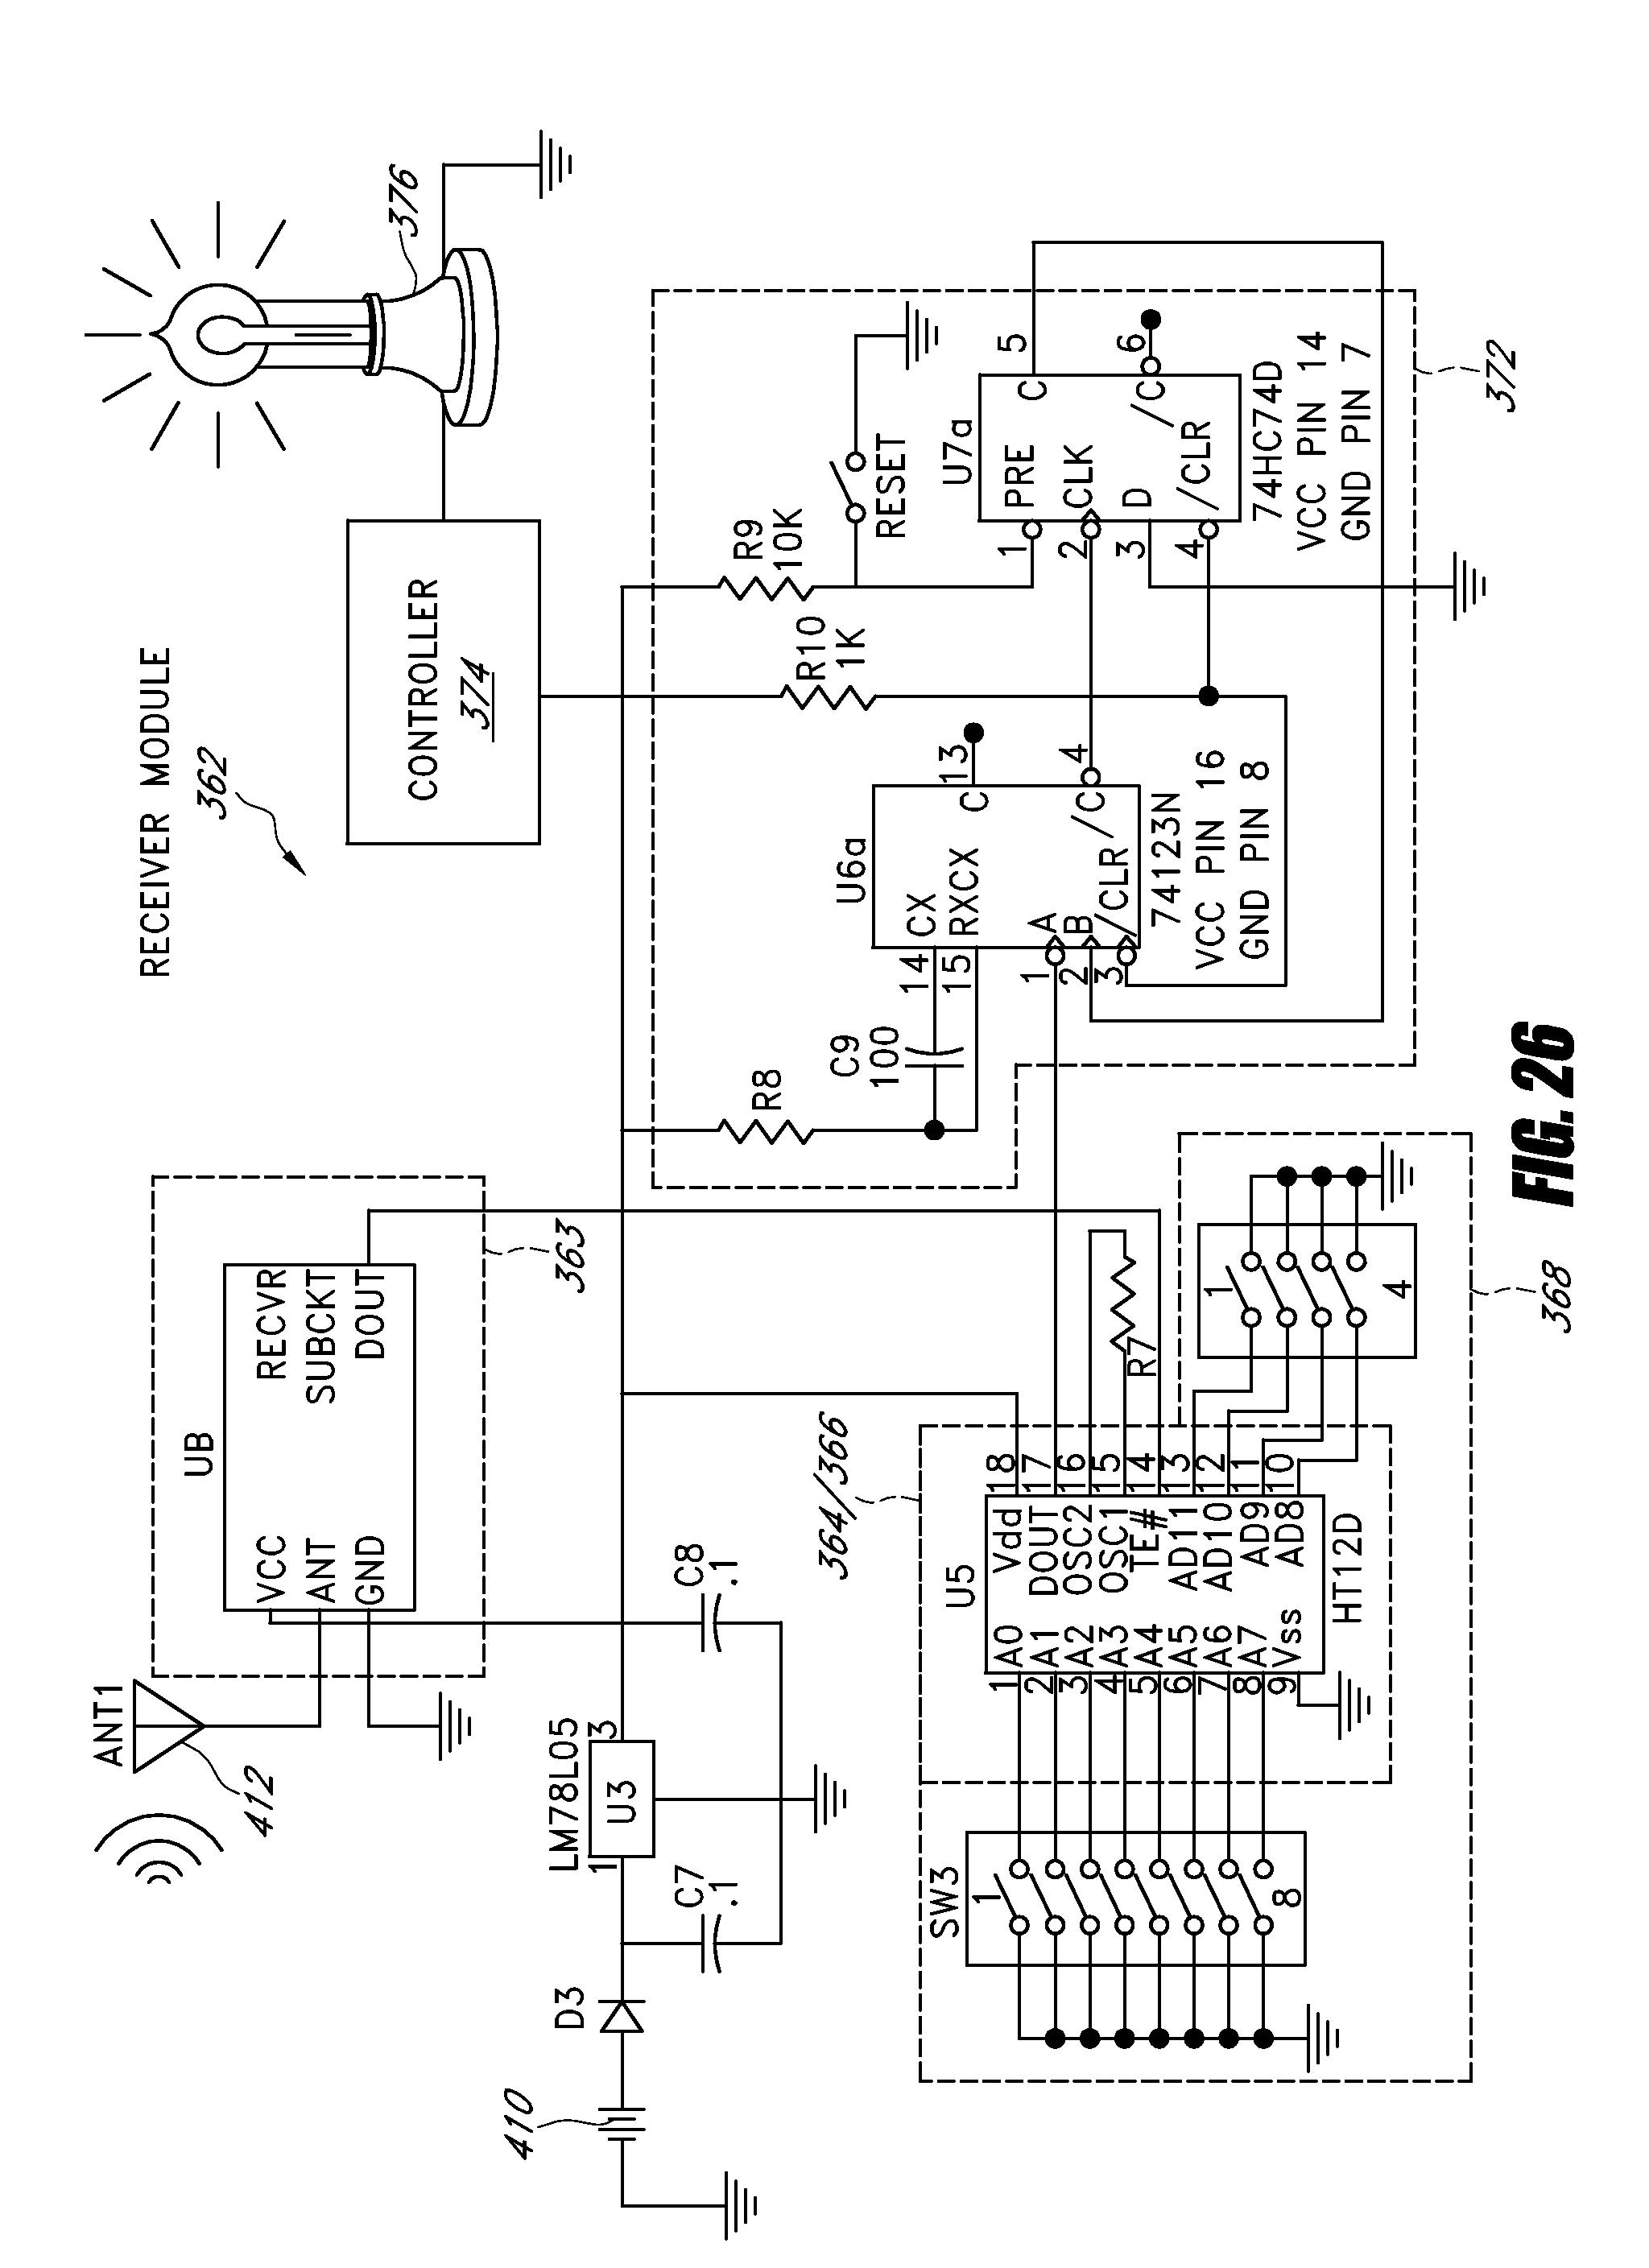 Patent US 8,368,648 B2